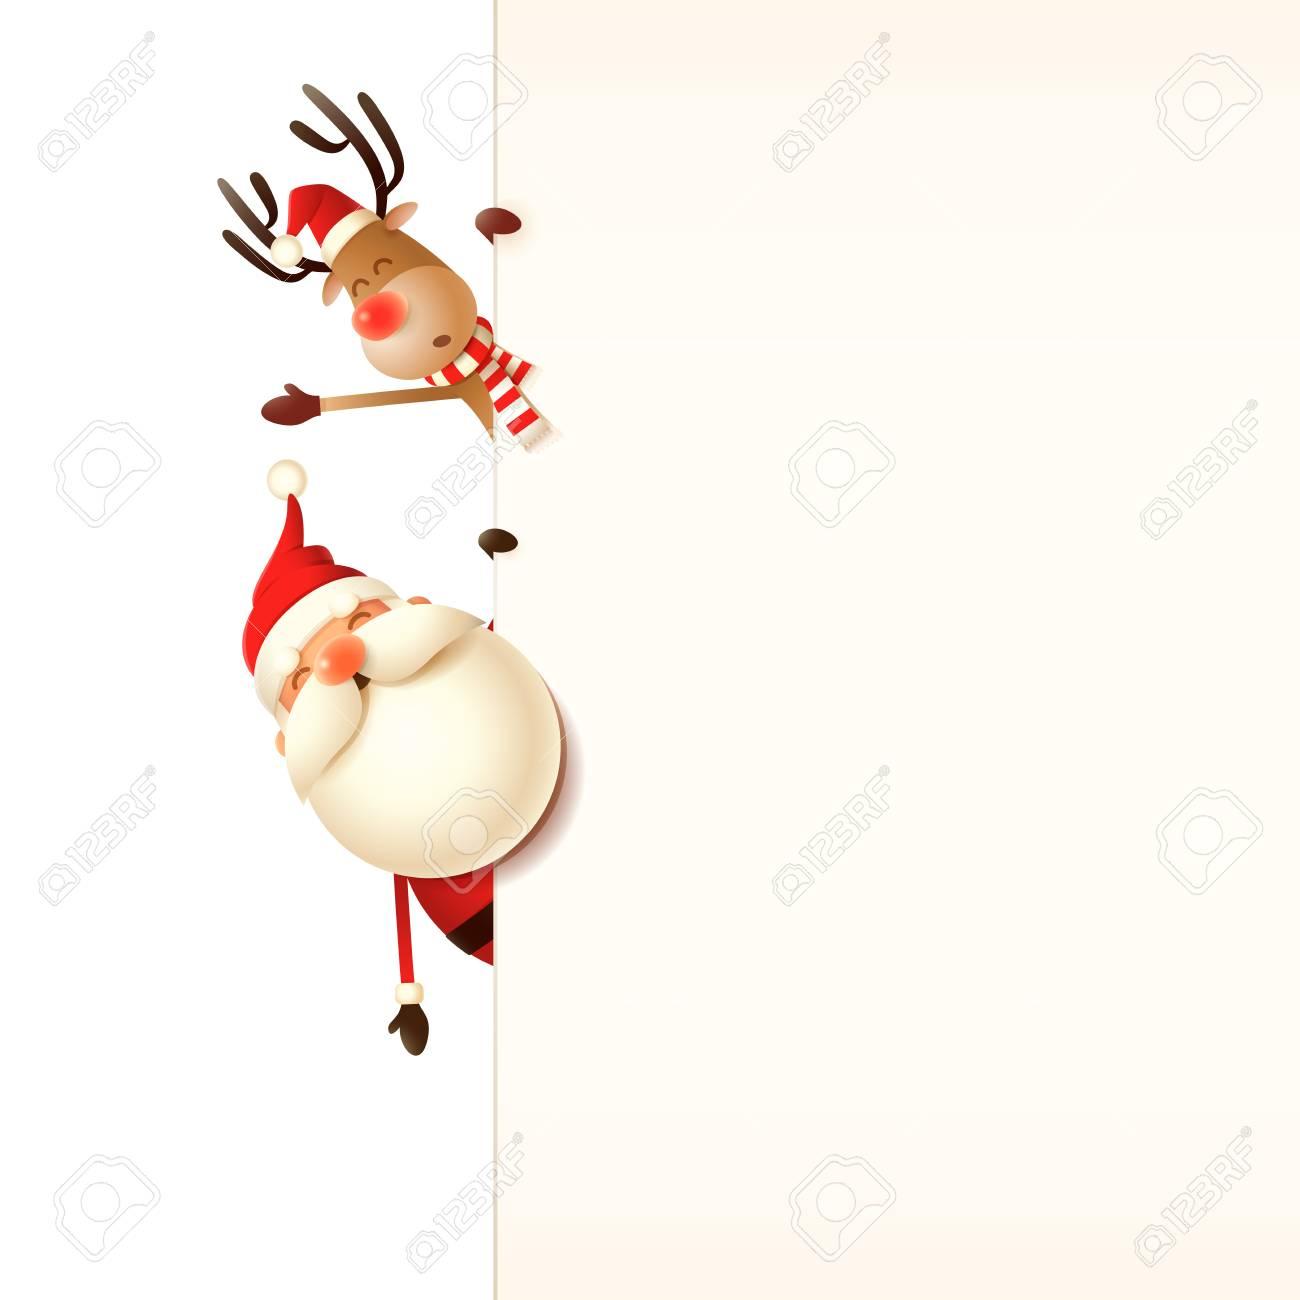 Christmas Greeting Card Template Santa Claus And Reindeer Peeking